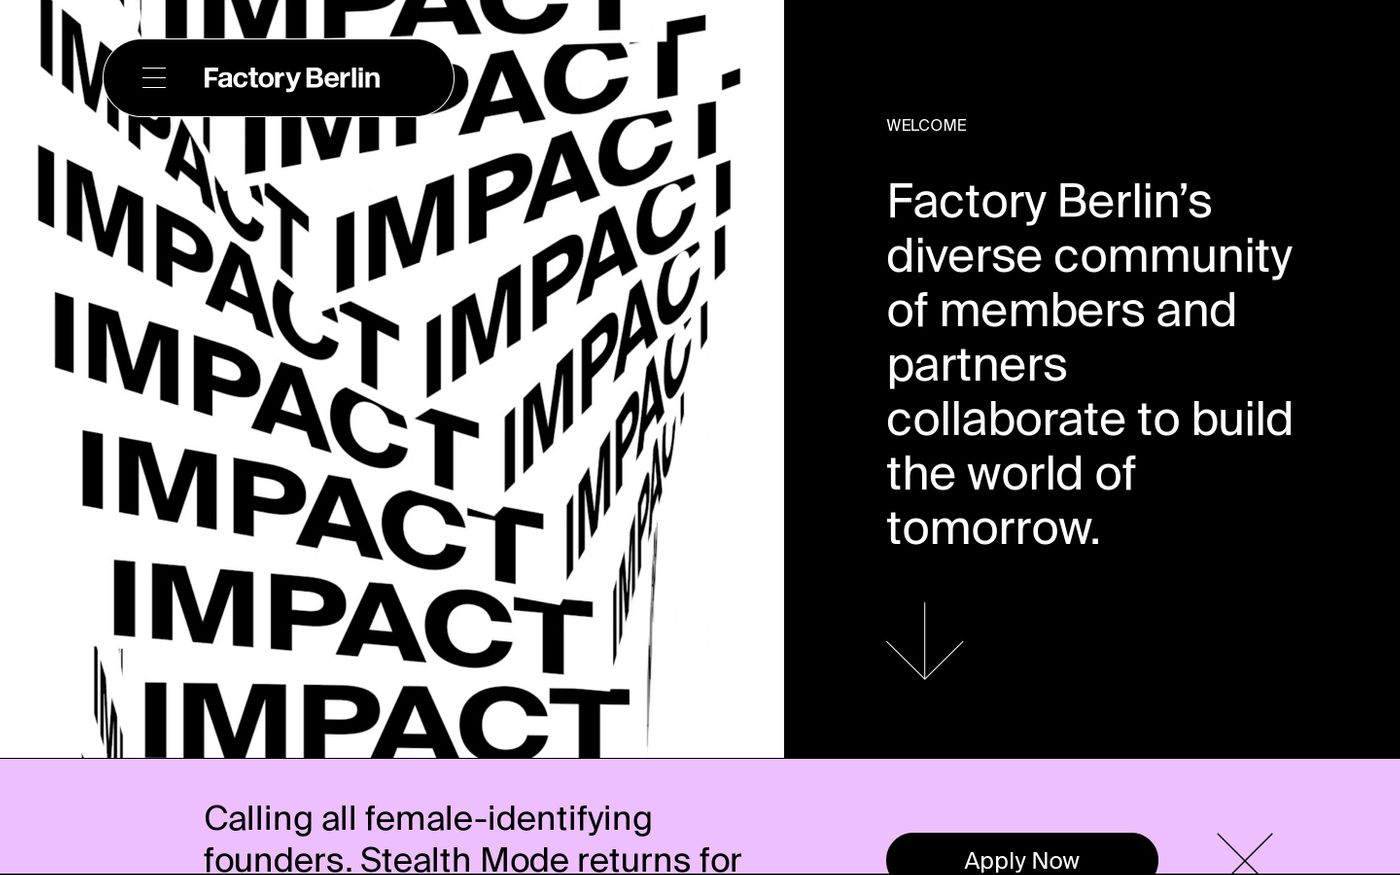 Screenshot of Factory Berlin website